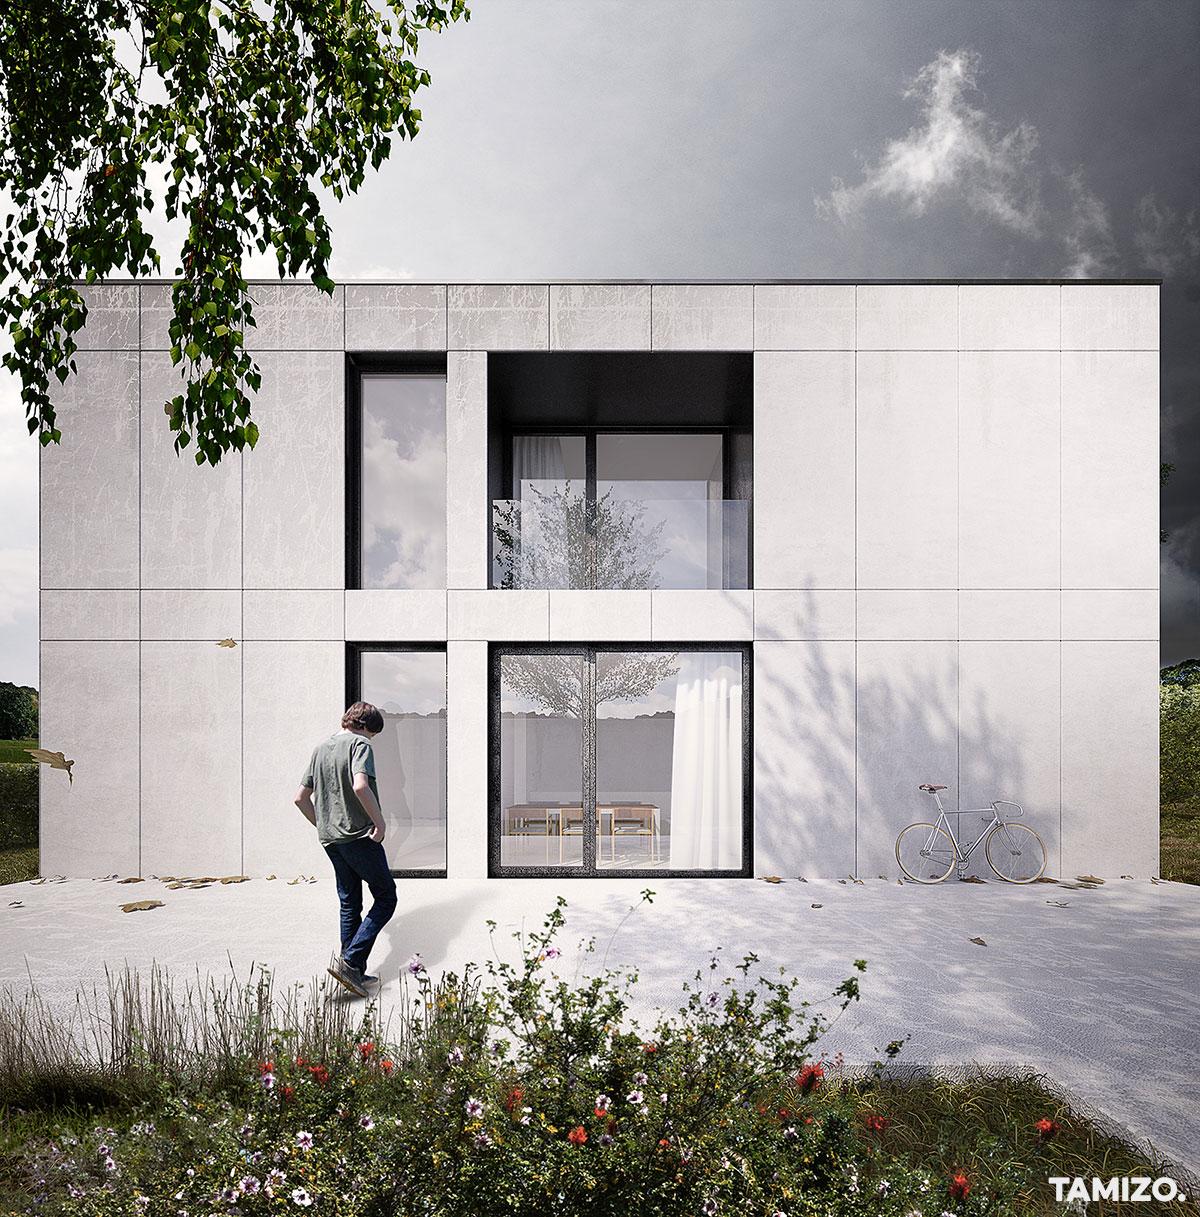 A063_tamizo_architects_mateusz_kuo_stolarski_dom_projekt_wojtka_pabianice_maly_domek_05